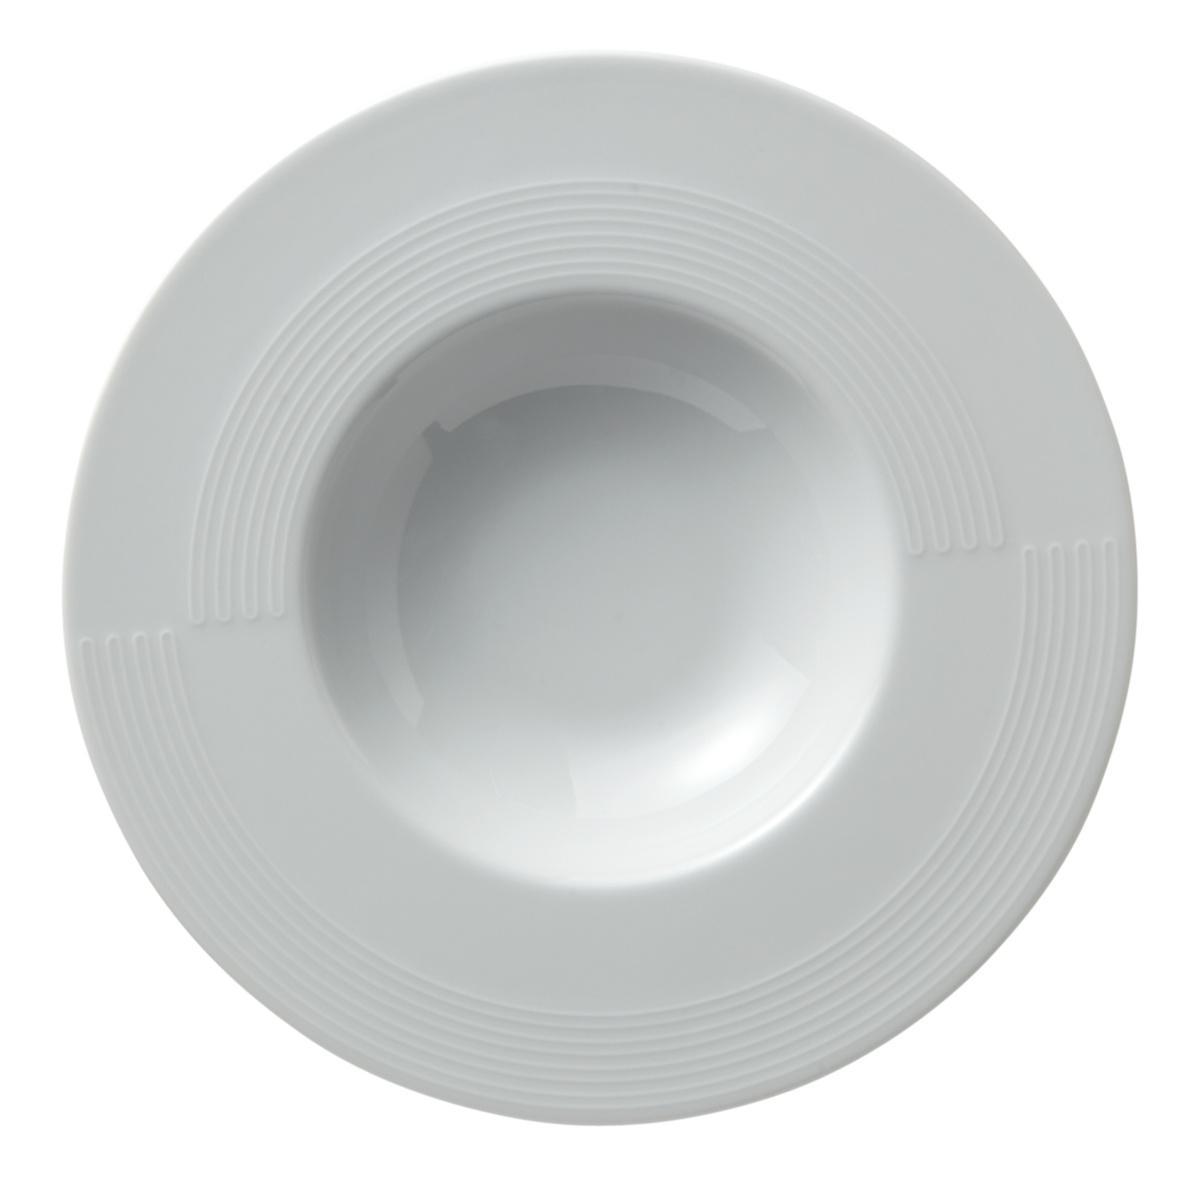 Assiette extra creuse rond blanc Gourmet